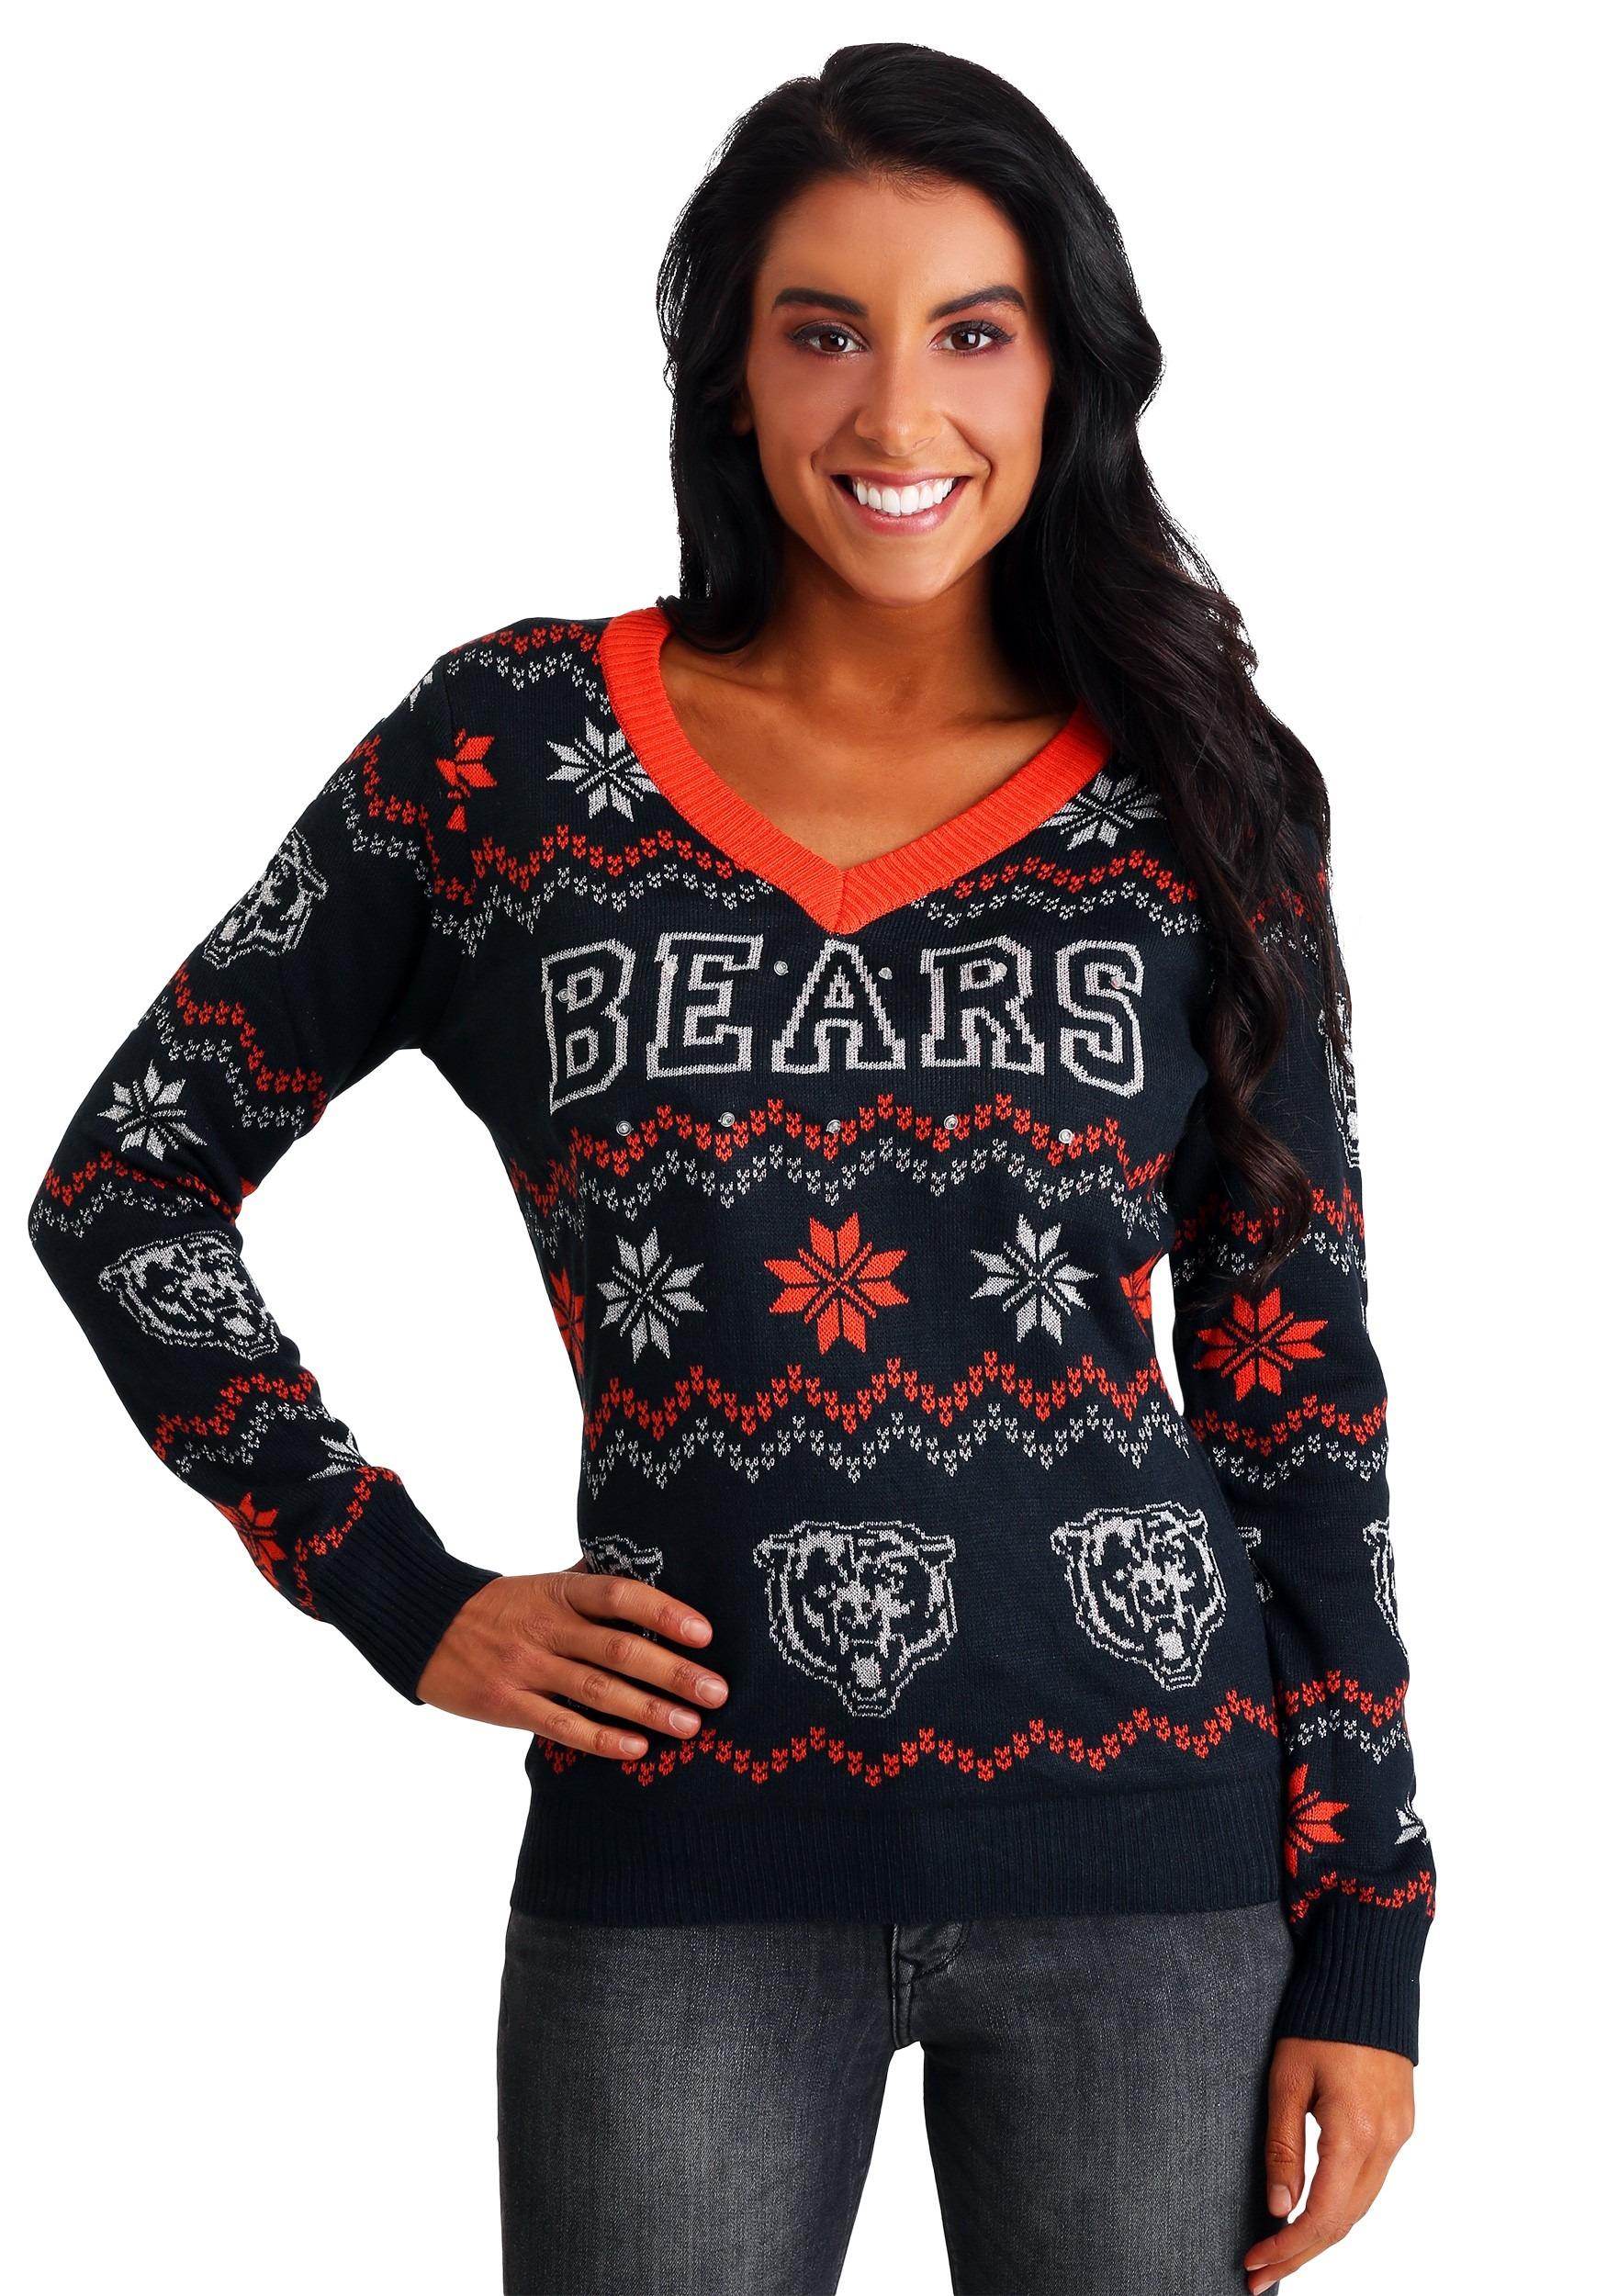 sale retailer 7cdd3 75857 Women's Chicago Bears Light Up V-Neck Ugly Christmas Sweater